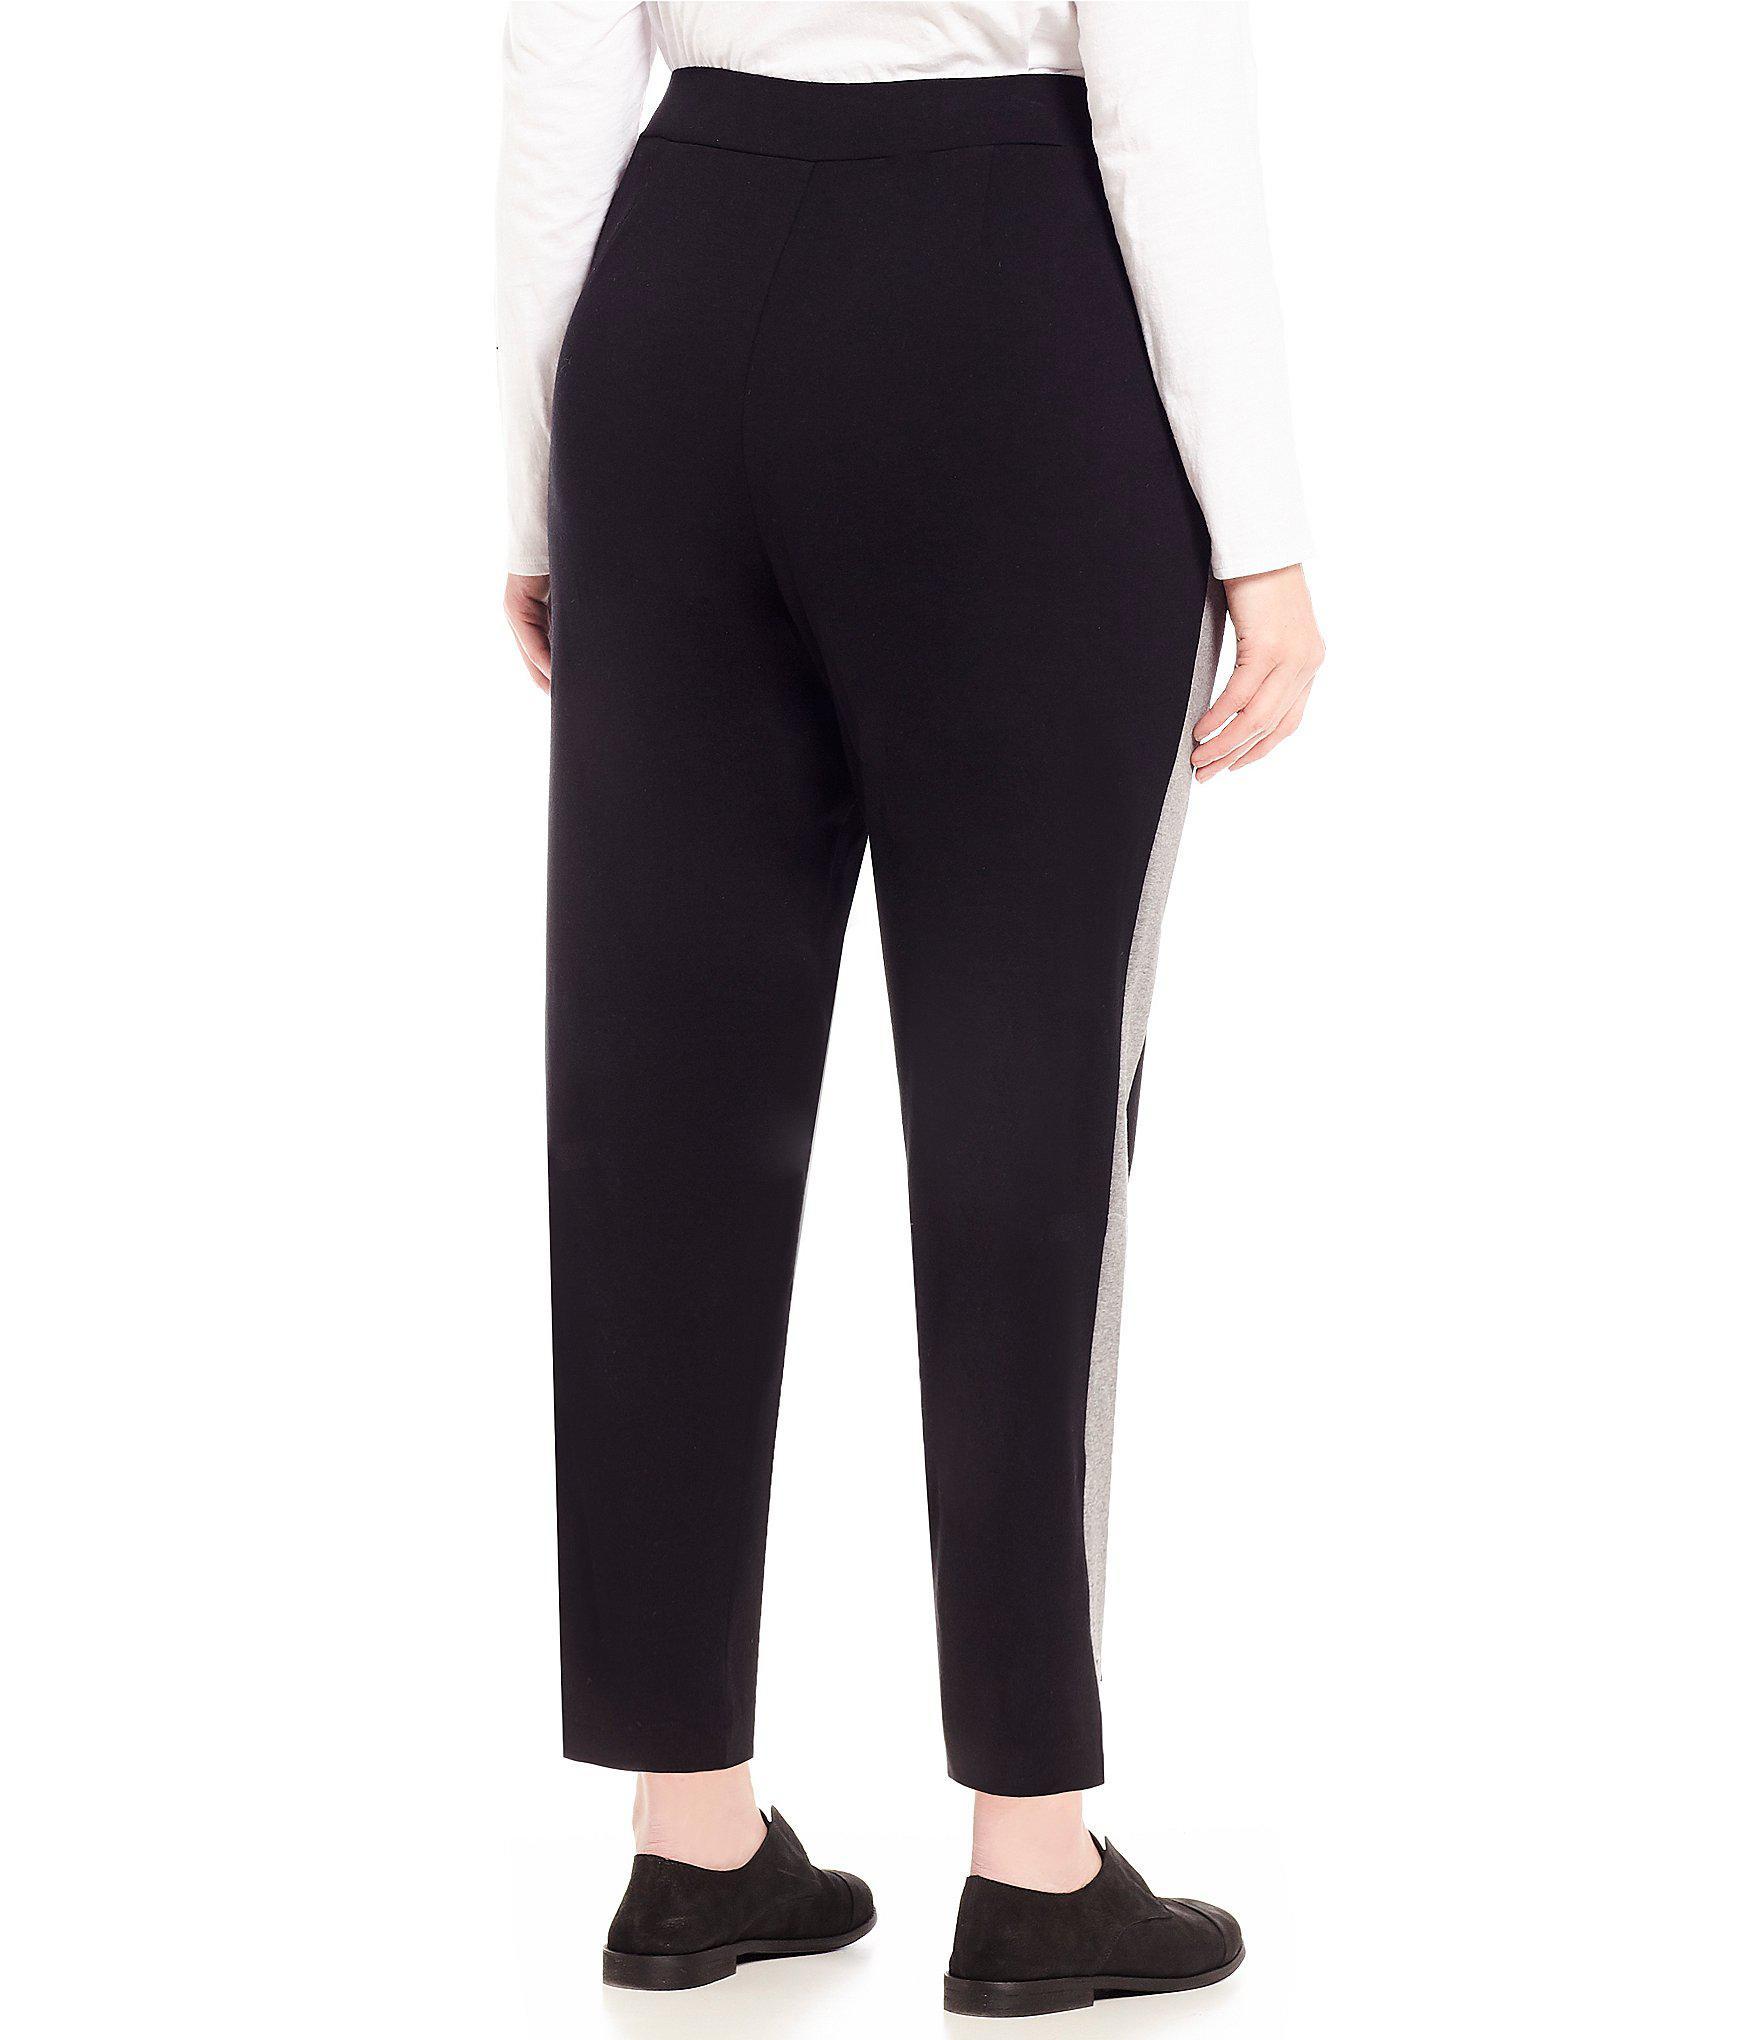 ae04b7c39b4 Eileen Fisher - Black Plus Size Pull-on Side Vents Slim Pants - Lyst. View  fullscreen